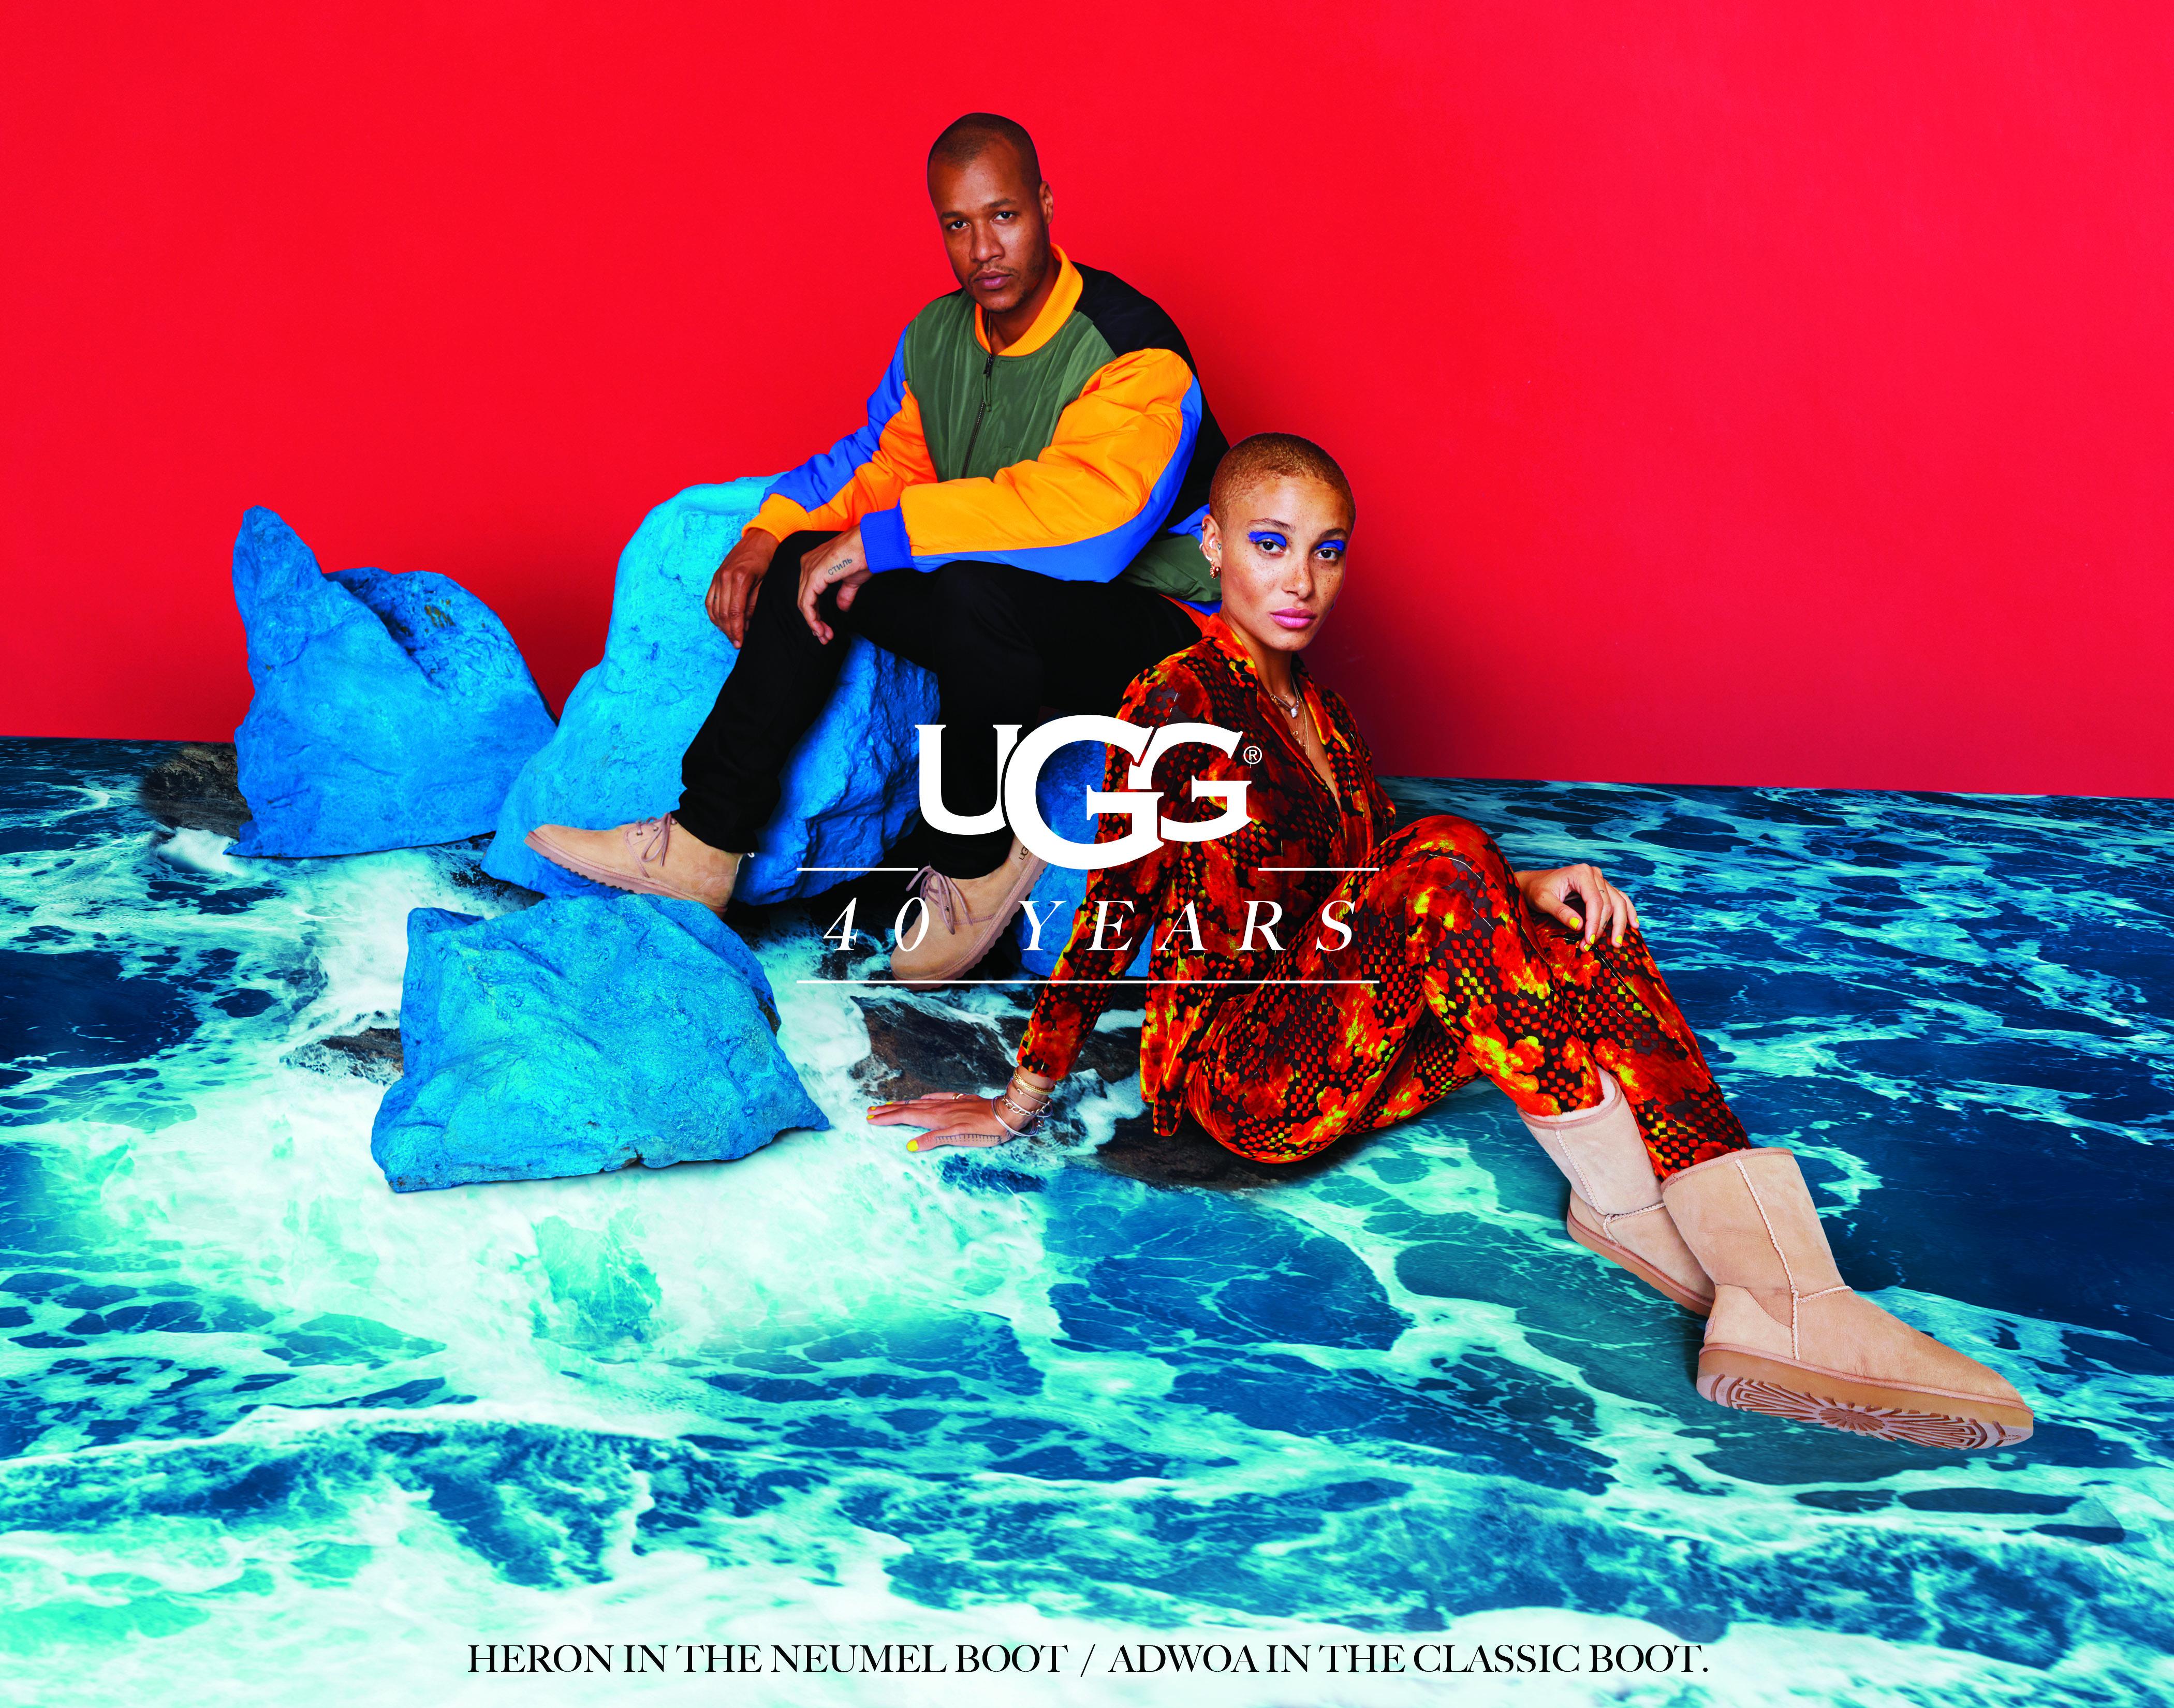 UGG's 40th Anniversary campaign starring Heron Preston and Adwoa Aboah